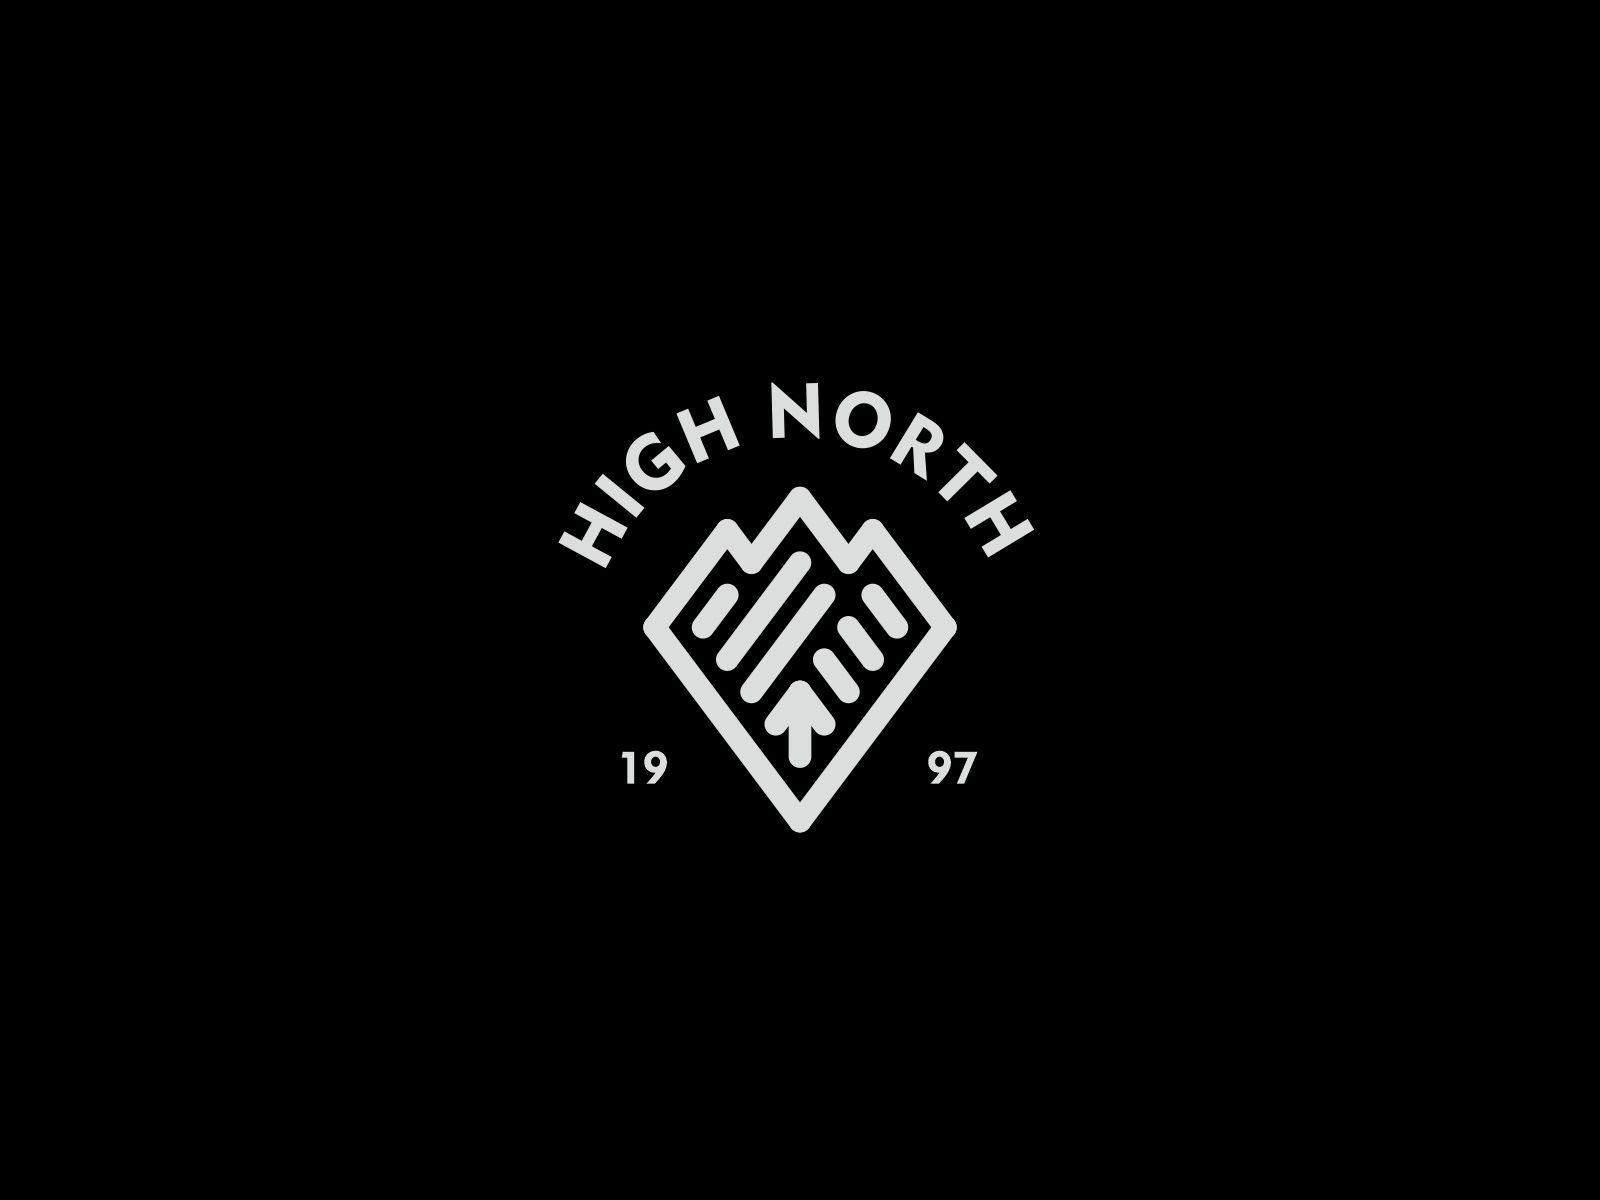 High North 2 by Catur Argi